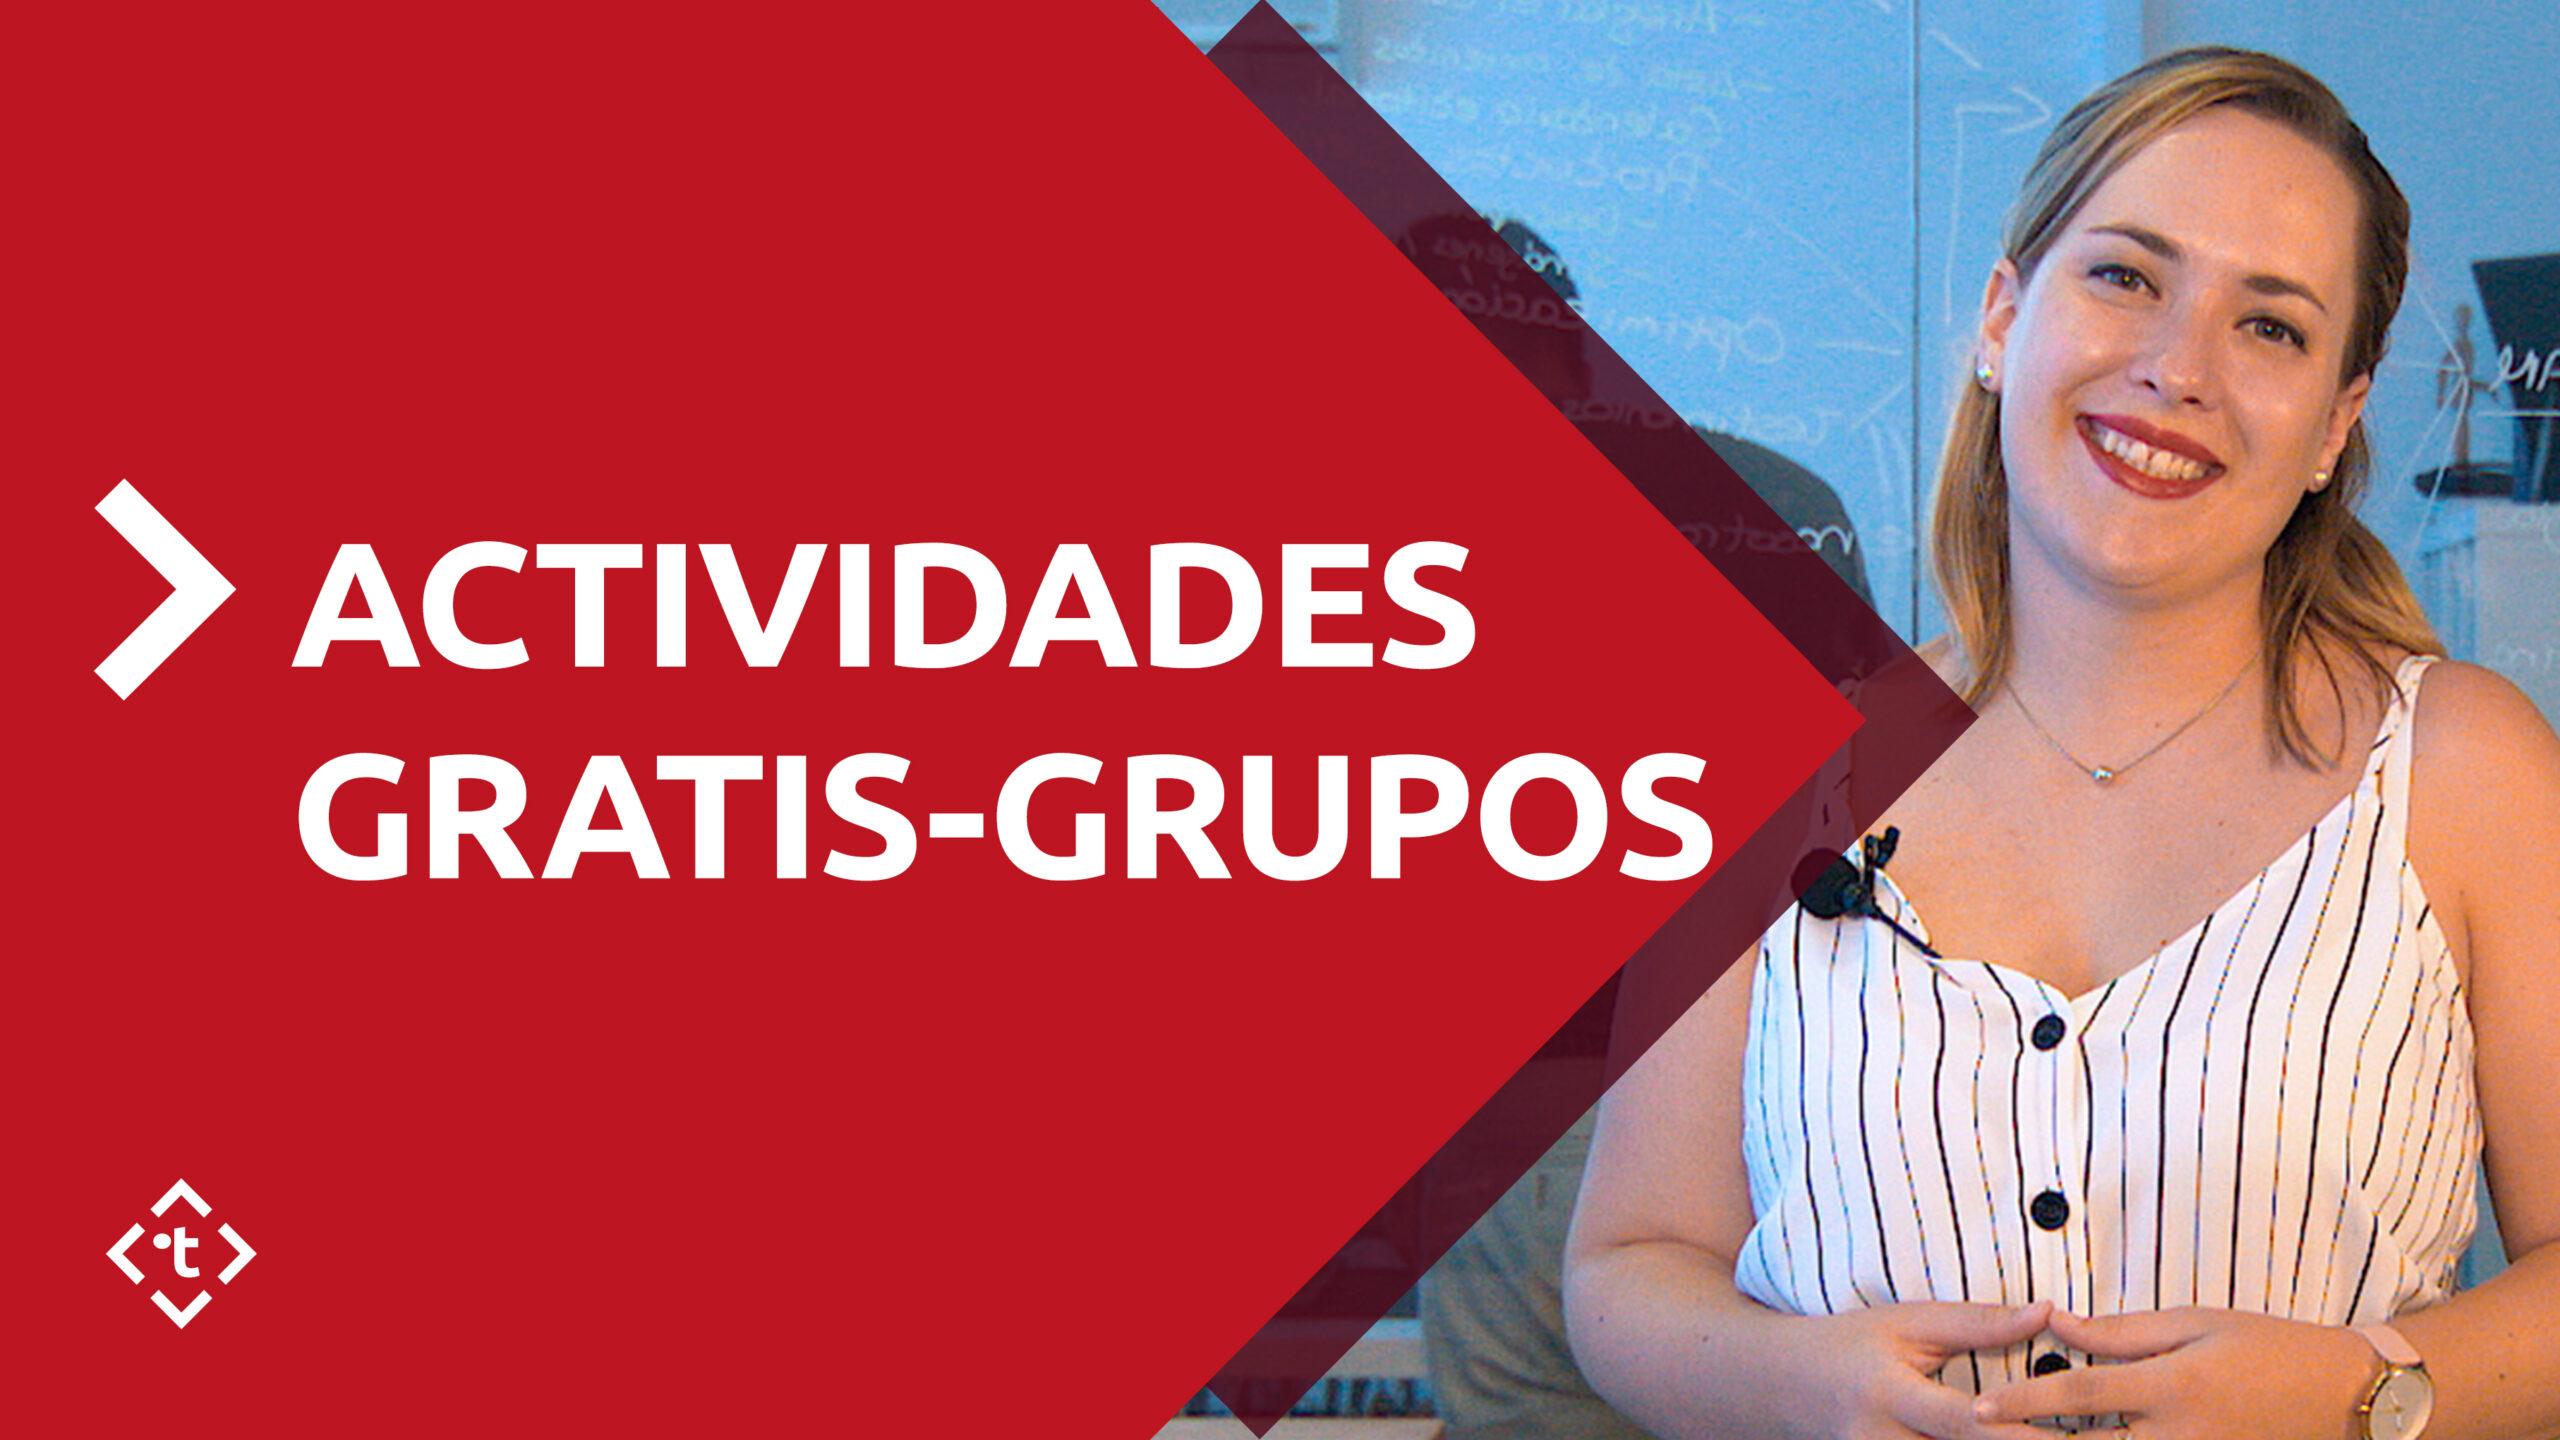 ACTIVIDADES GRATIS-GRUPOS